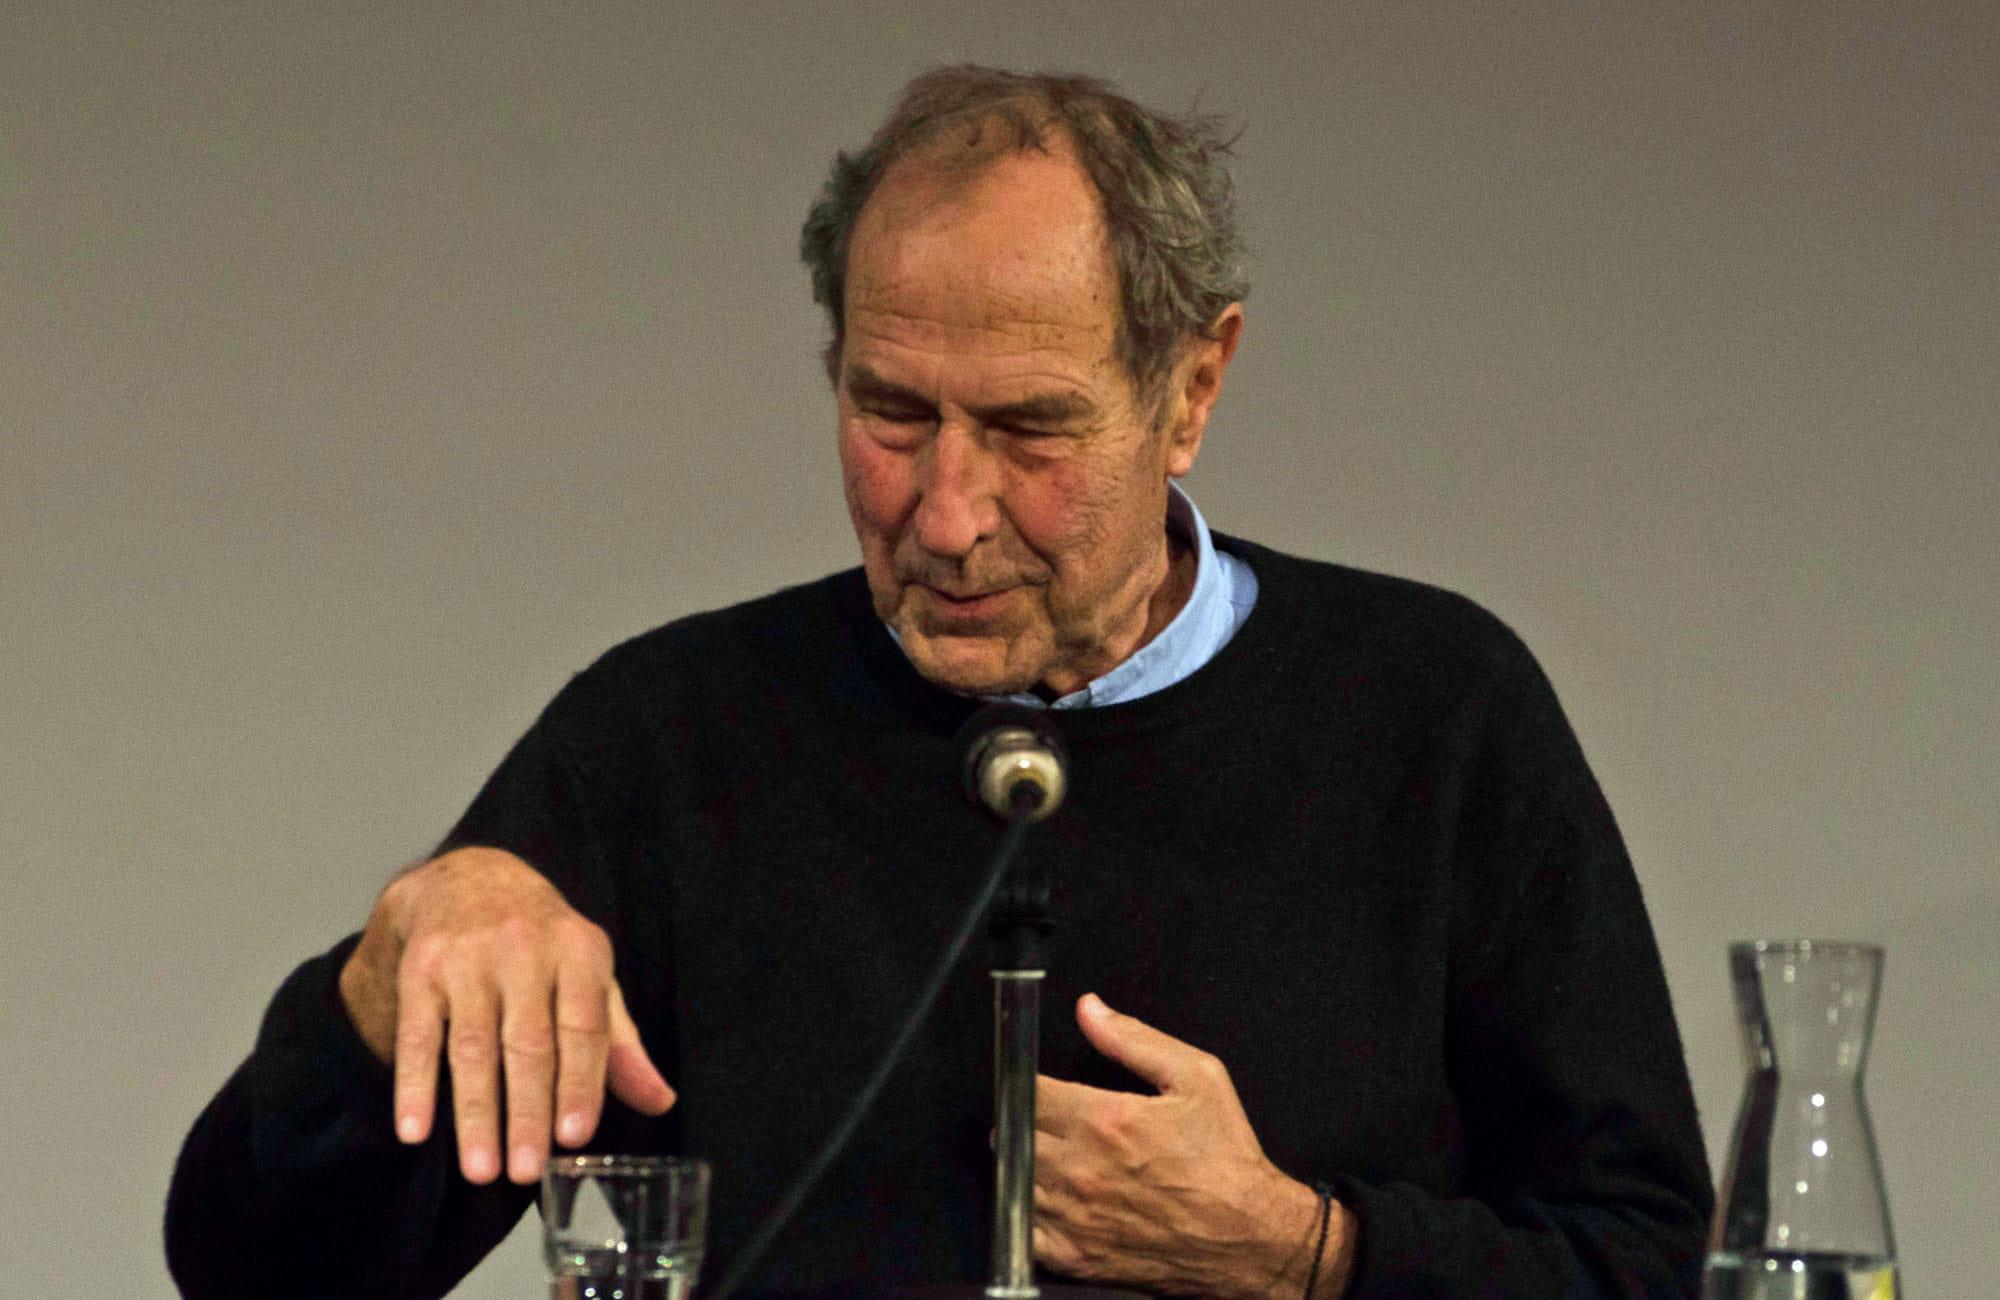 Michael Krüger, Matthias Bormuth: Gäule der Erinnerung <br/>(c) Simon Adolphi